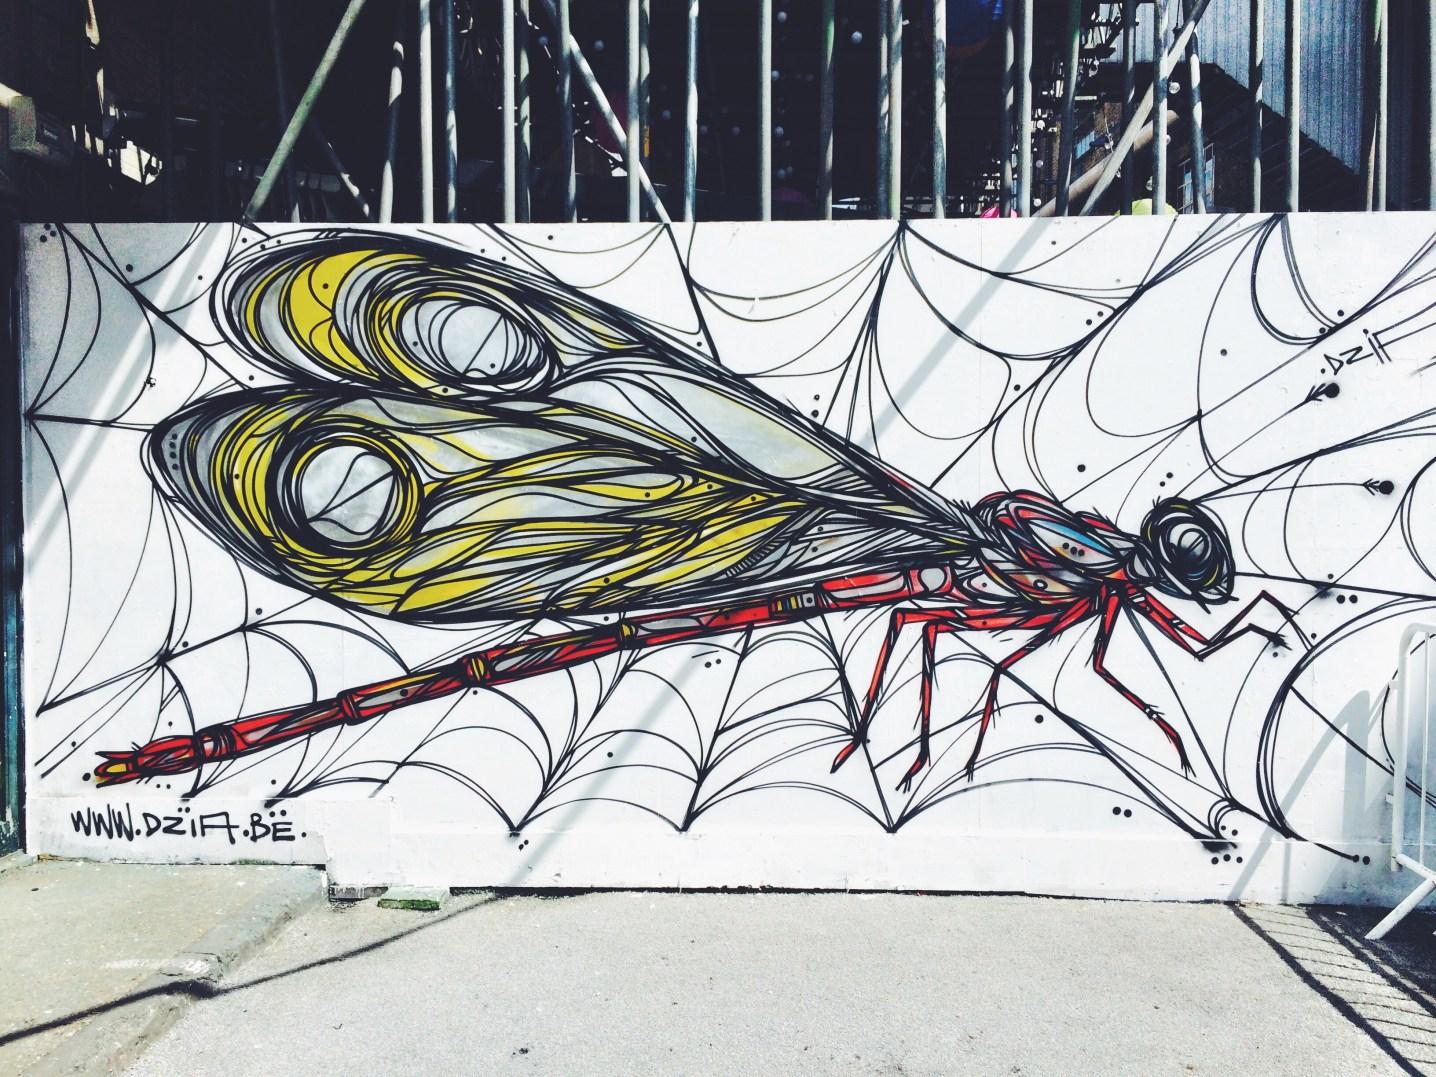 shoreditch street art dzia